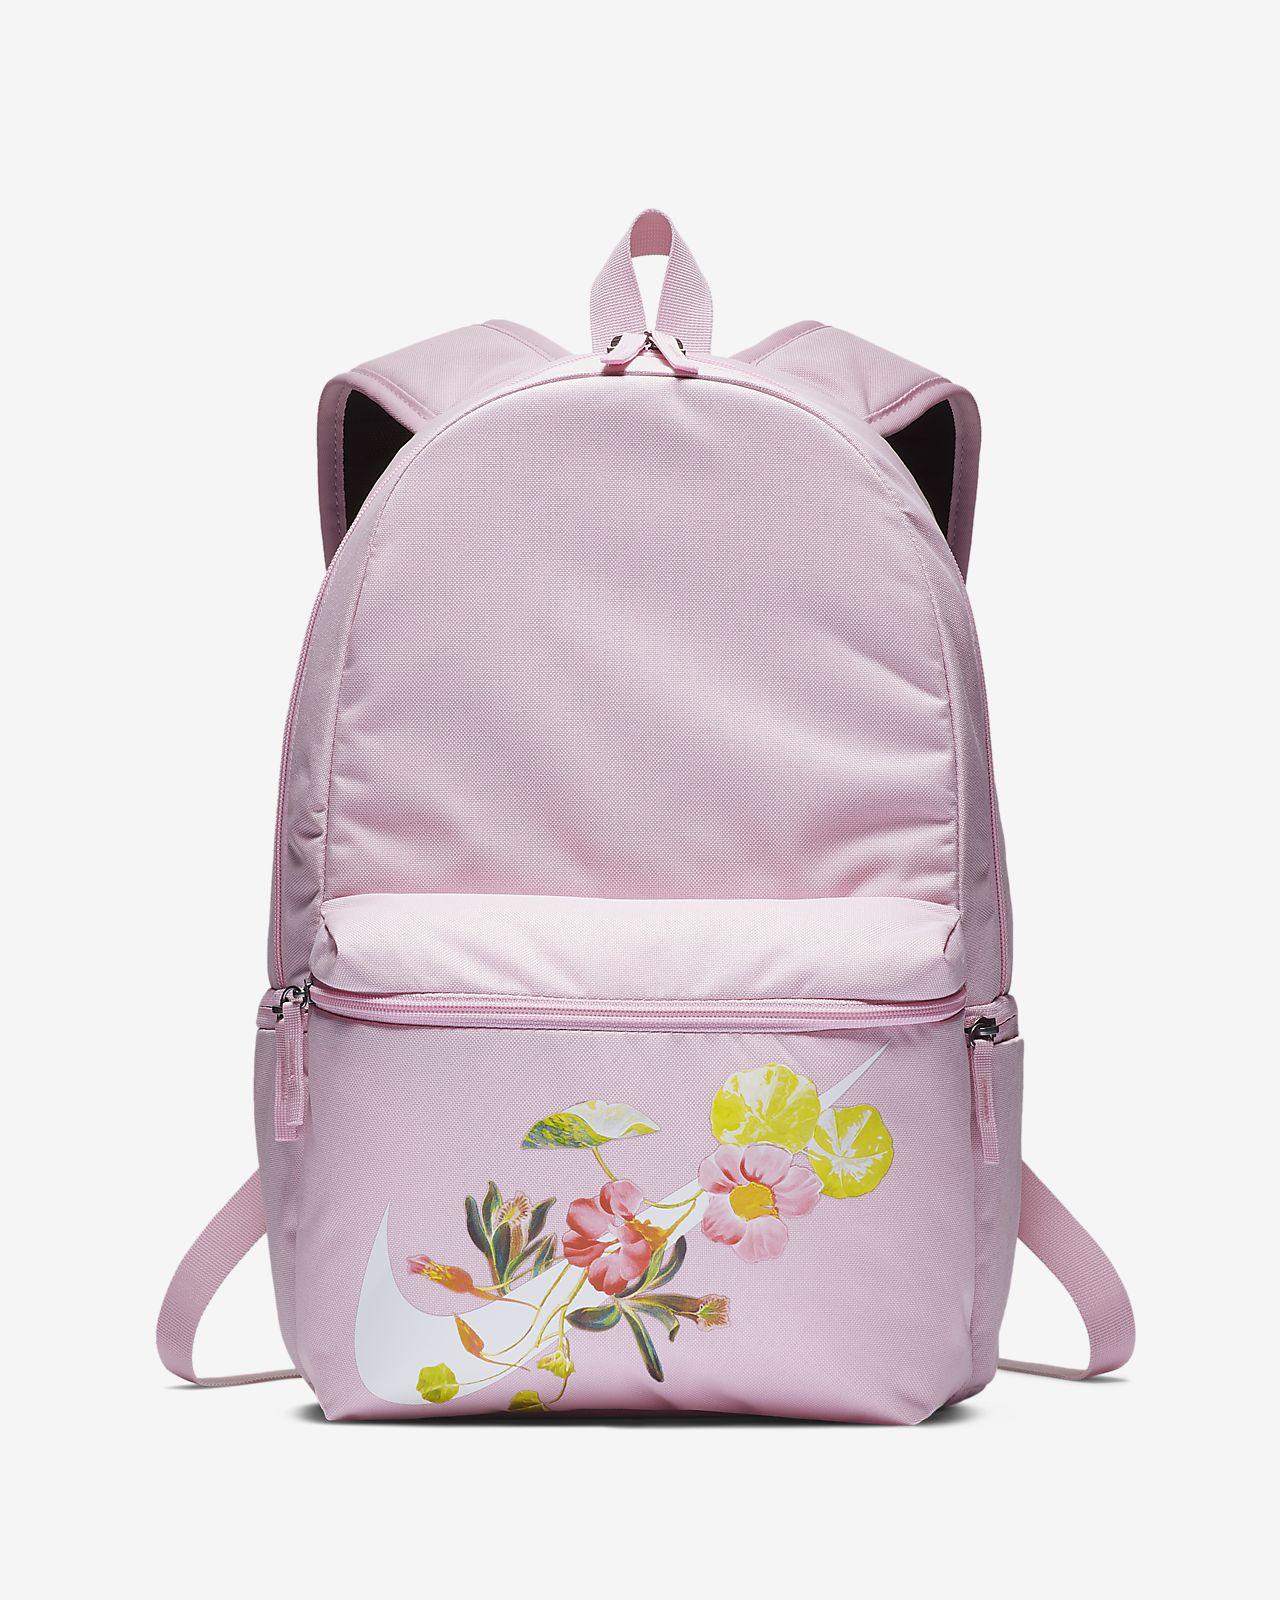 96eebd92402f Sportswear heritage graphic backpack tdvl jpg 1280x1600 Pink jordan  backpacks for girls